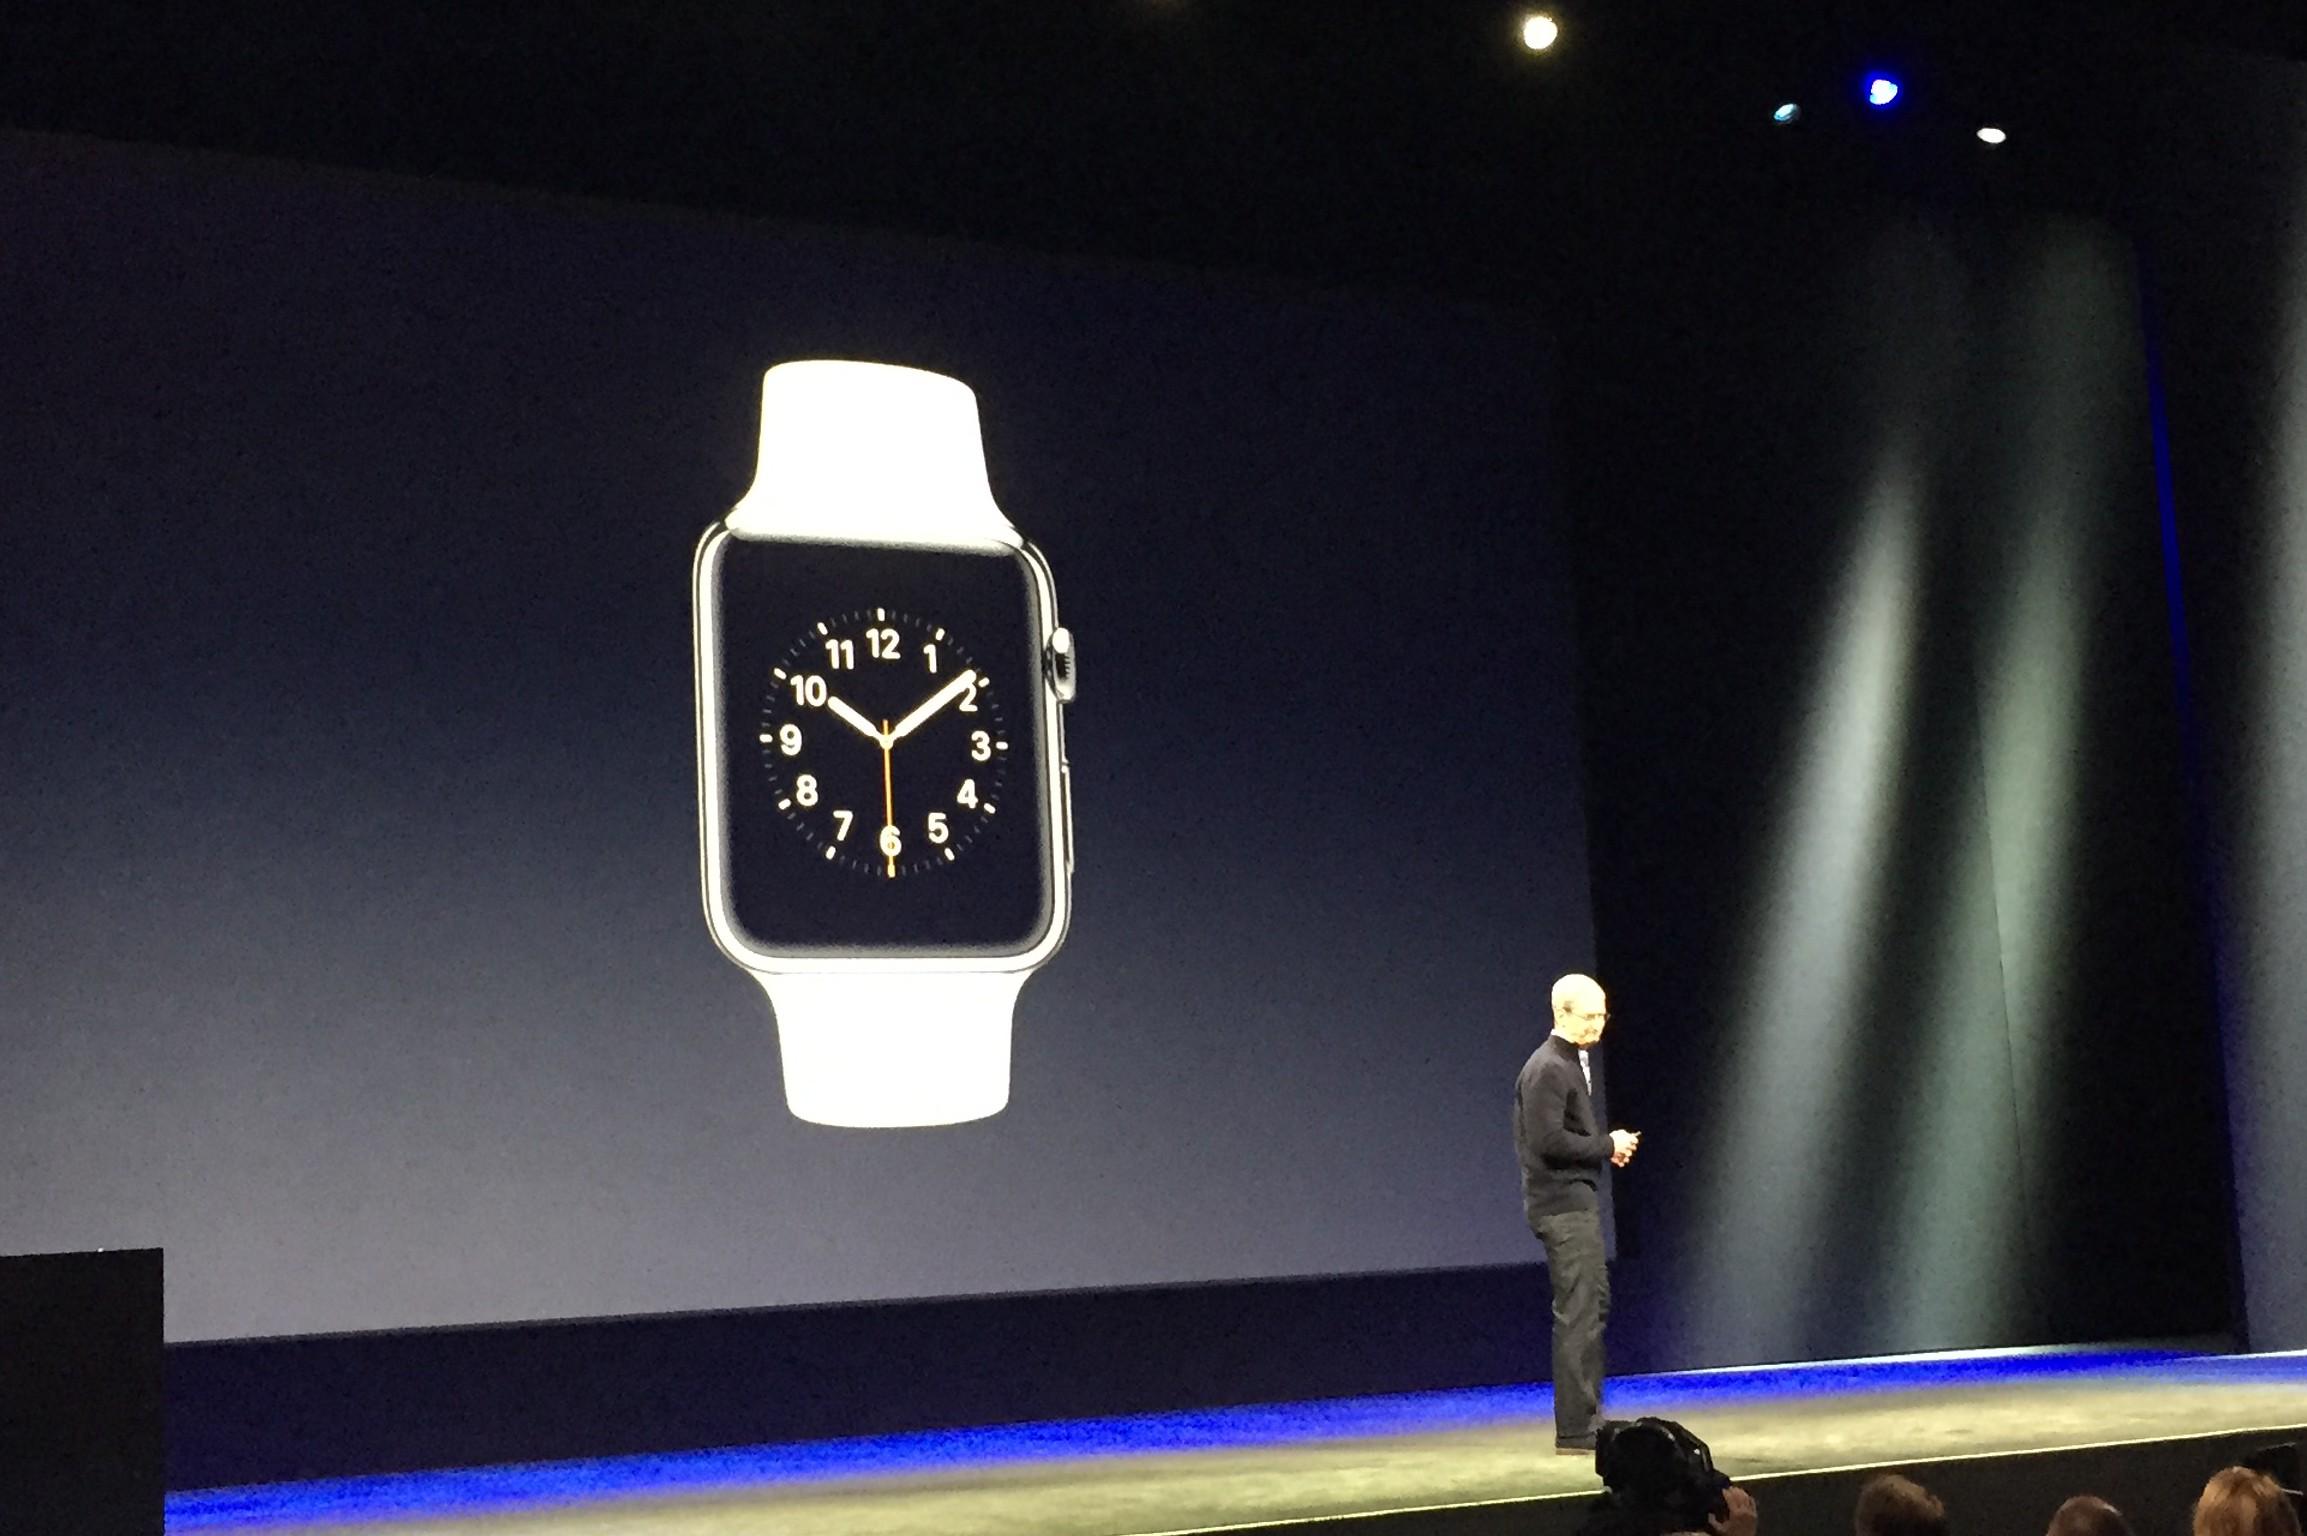 Apple's take on the smartwatch: Elegant evolution